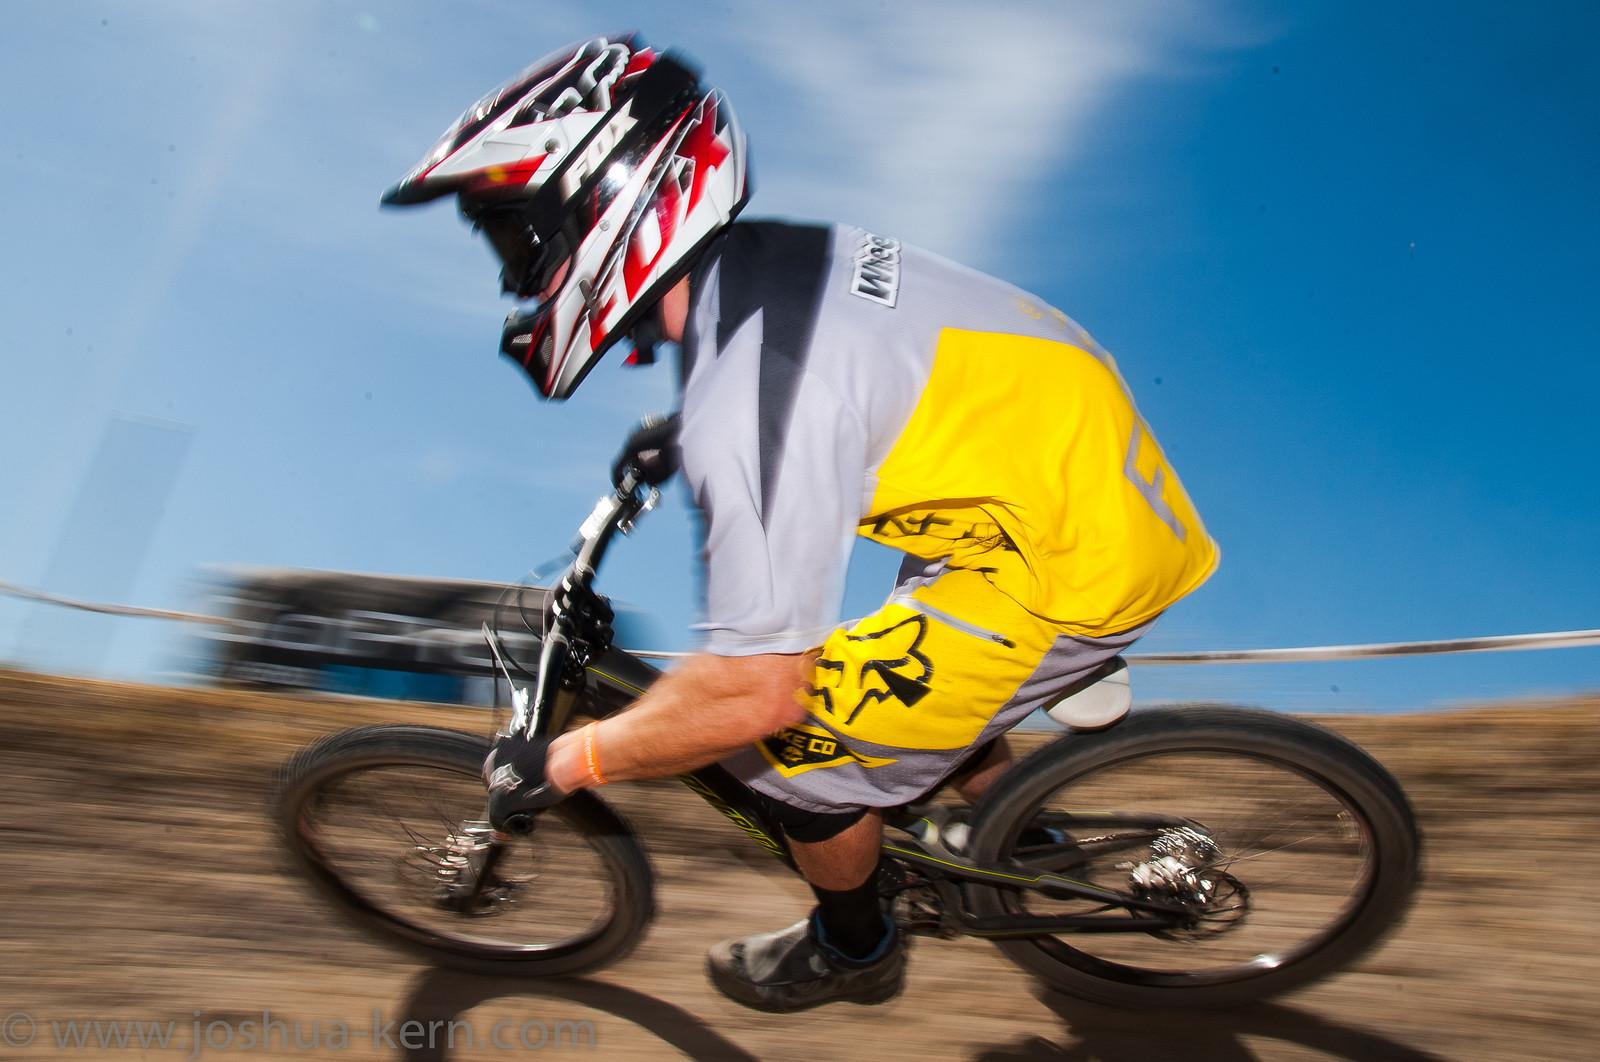 4-19-13DHPractice (36 of 36) - jkern620 - Mountain Biking Pictures - Vital MTB